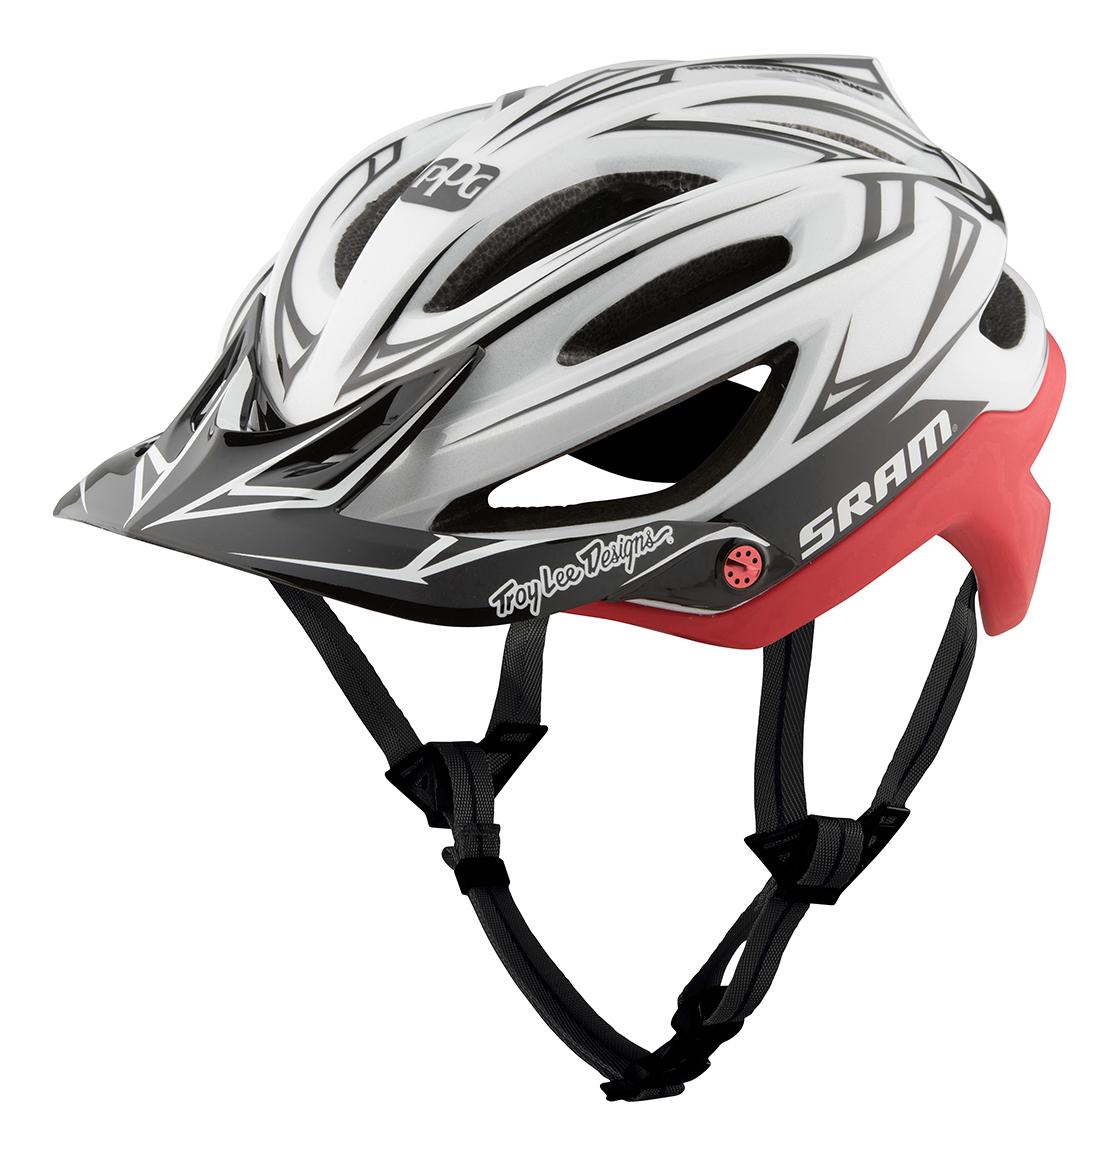 83d44df1a9efb Troy Lee Designs A2 Helmet MIPS SRAM Team White Red £111.99